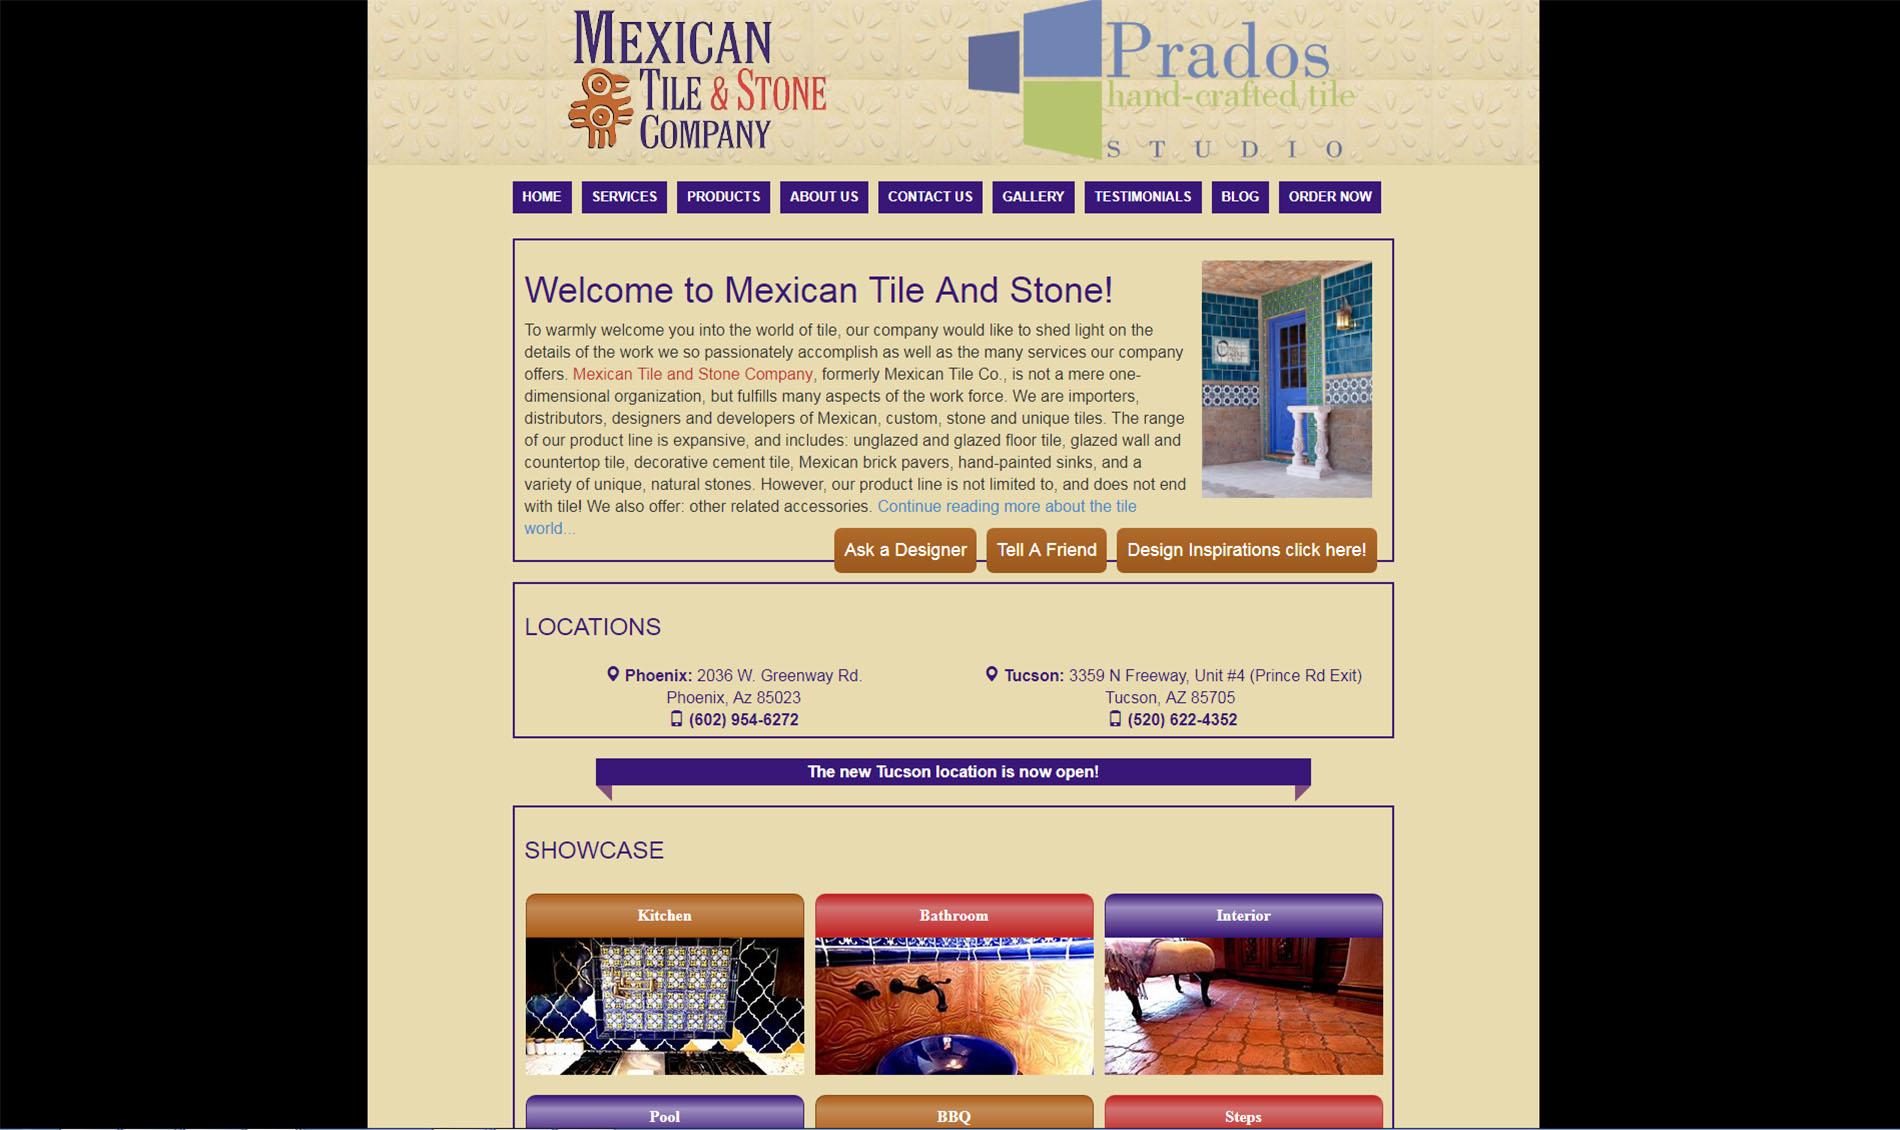 http://www.mexicantileandstone.com/